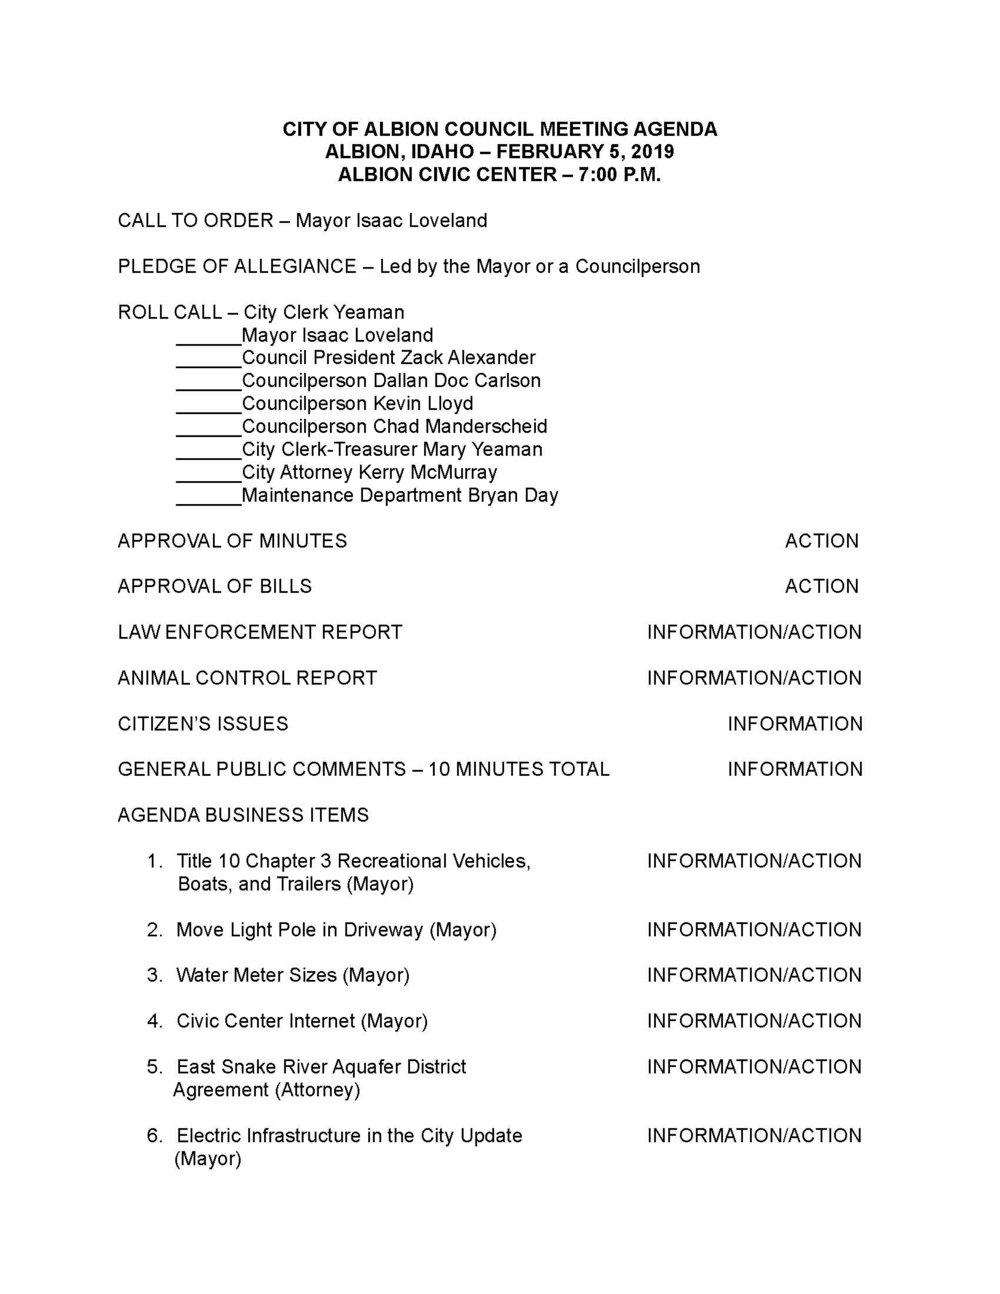 Agenda 02.05.19_Page_1.jpg